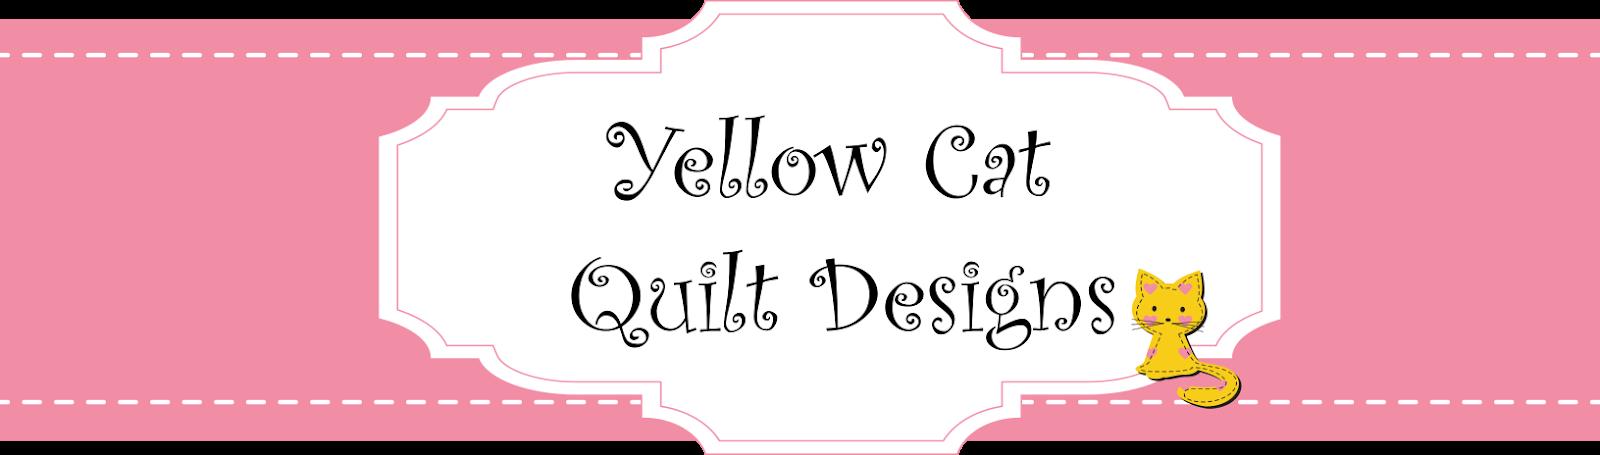 Yellow Cat Quilt Designs